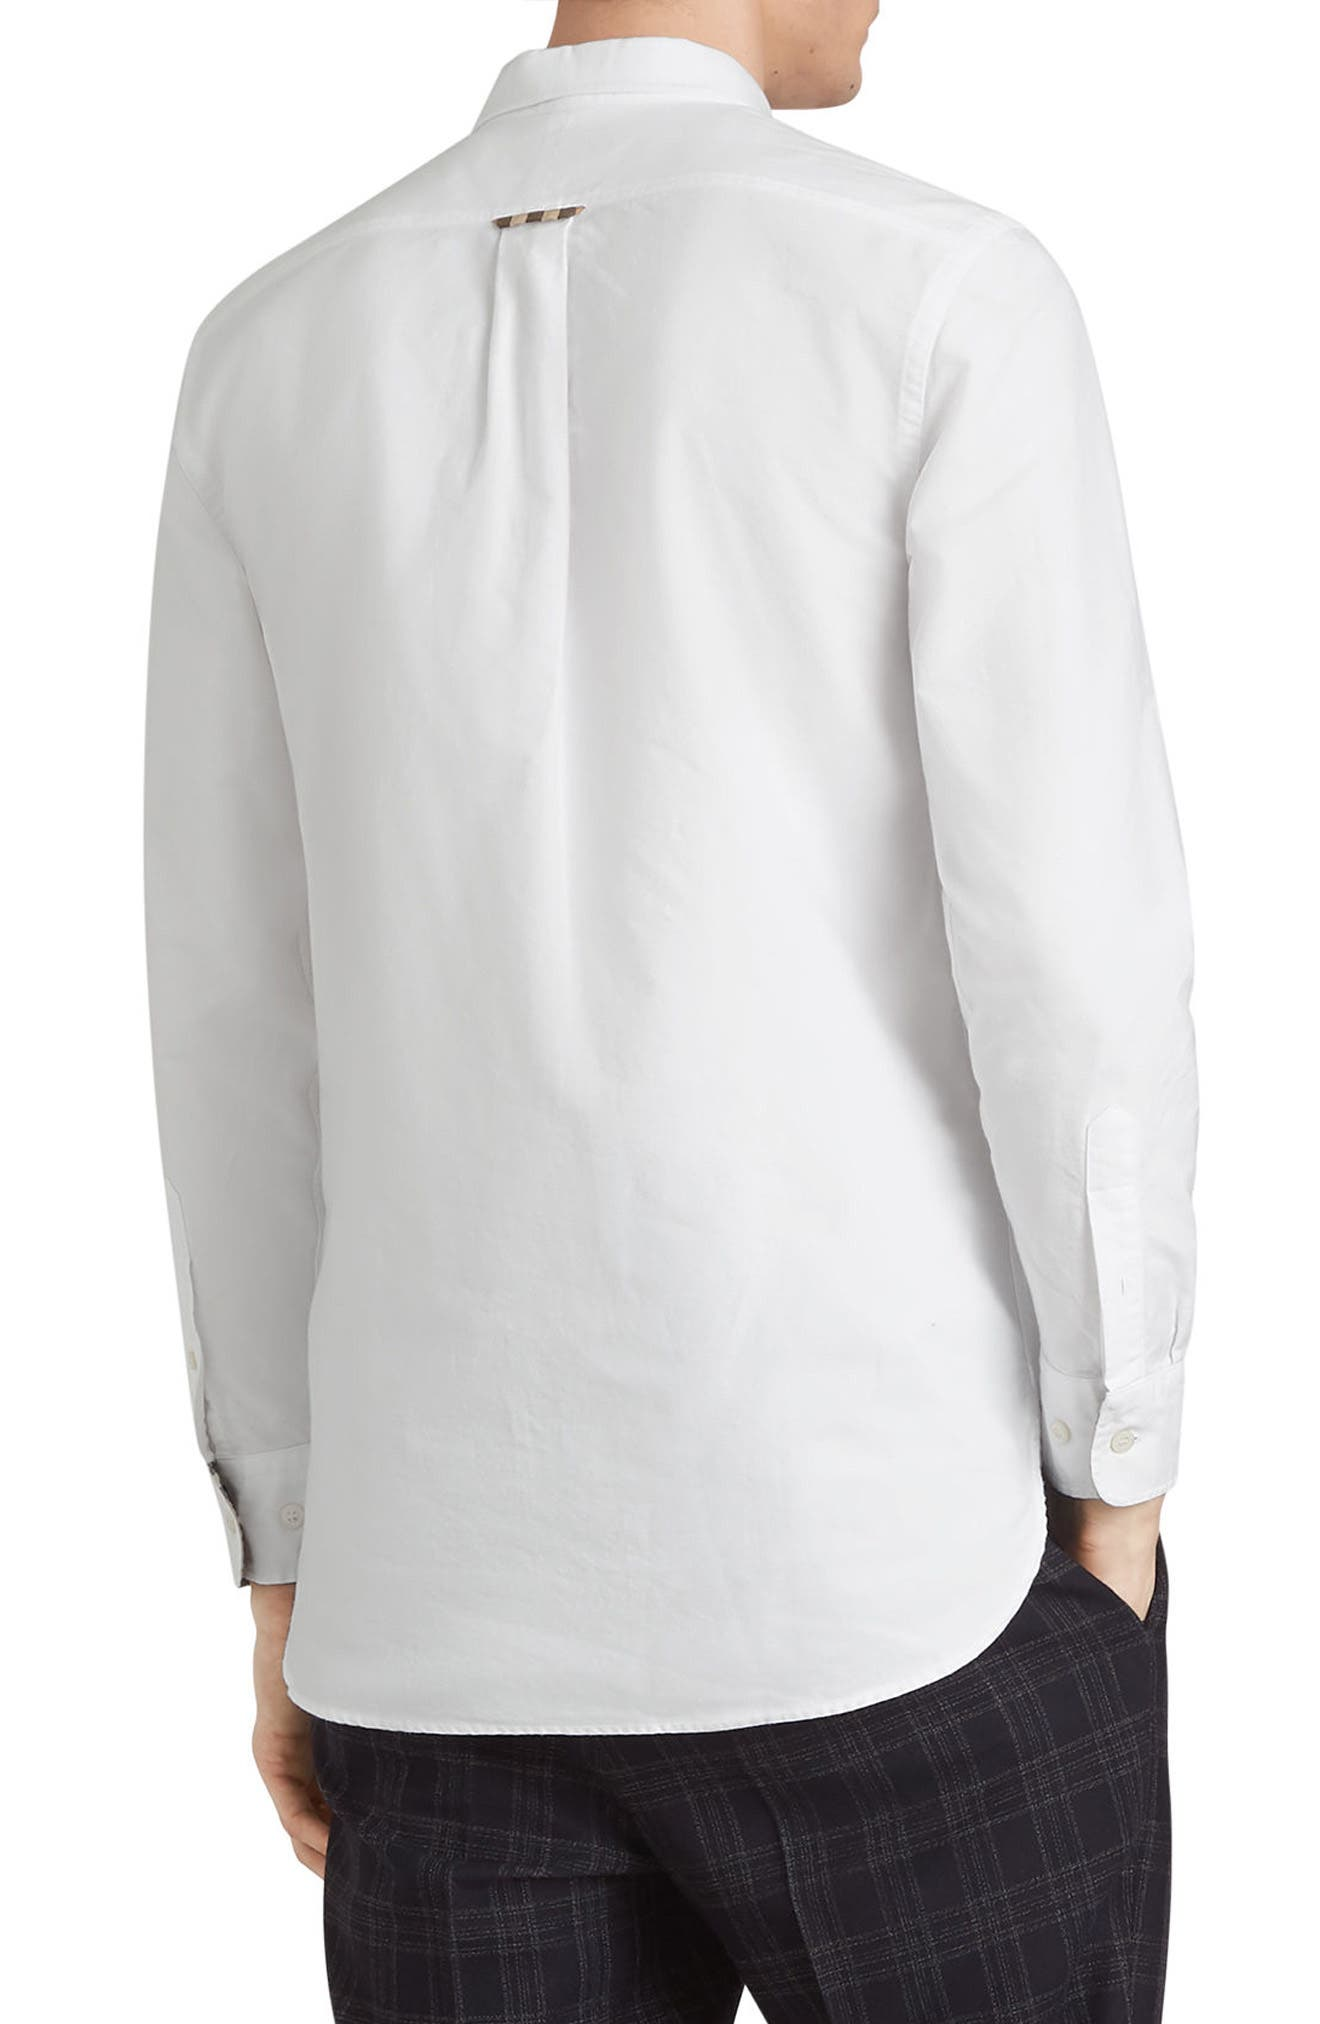 BURBERRY,                             Harry Check Trim Sport Shirt,                             Alternate thumbnail 4, color,                             WHITE